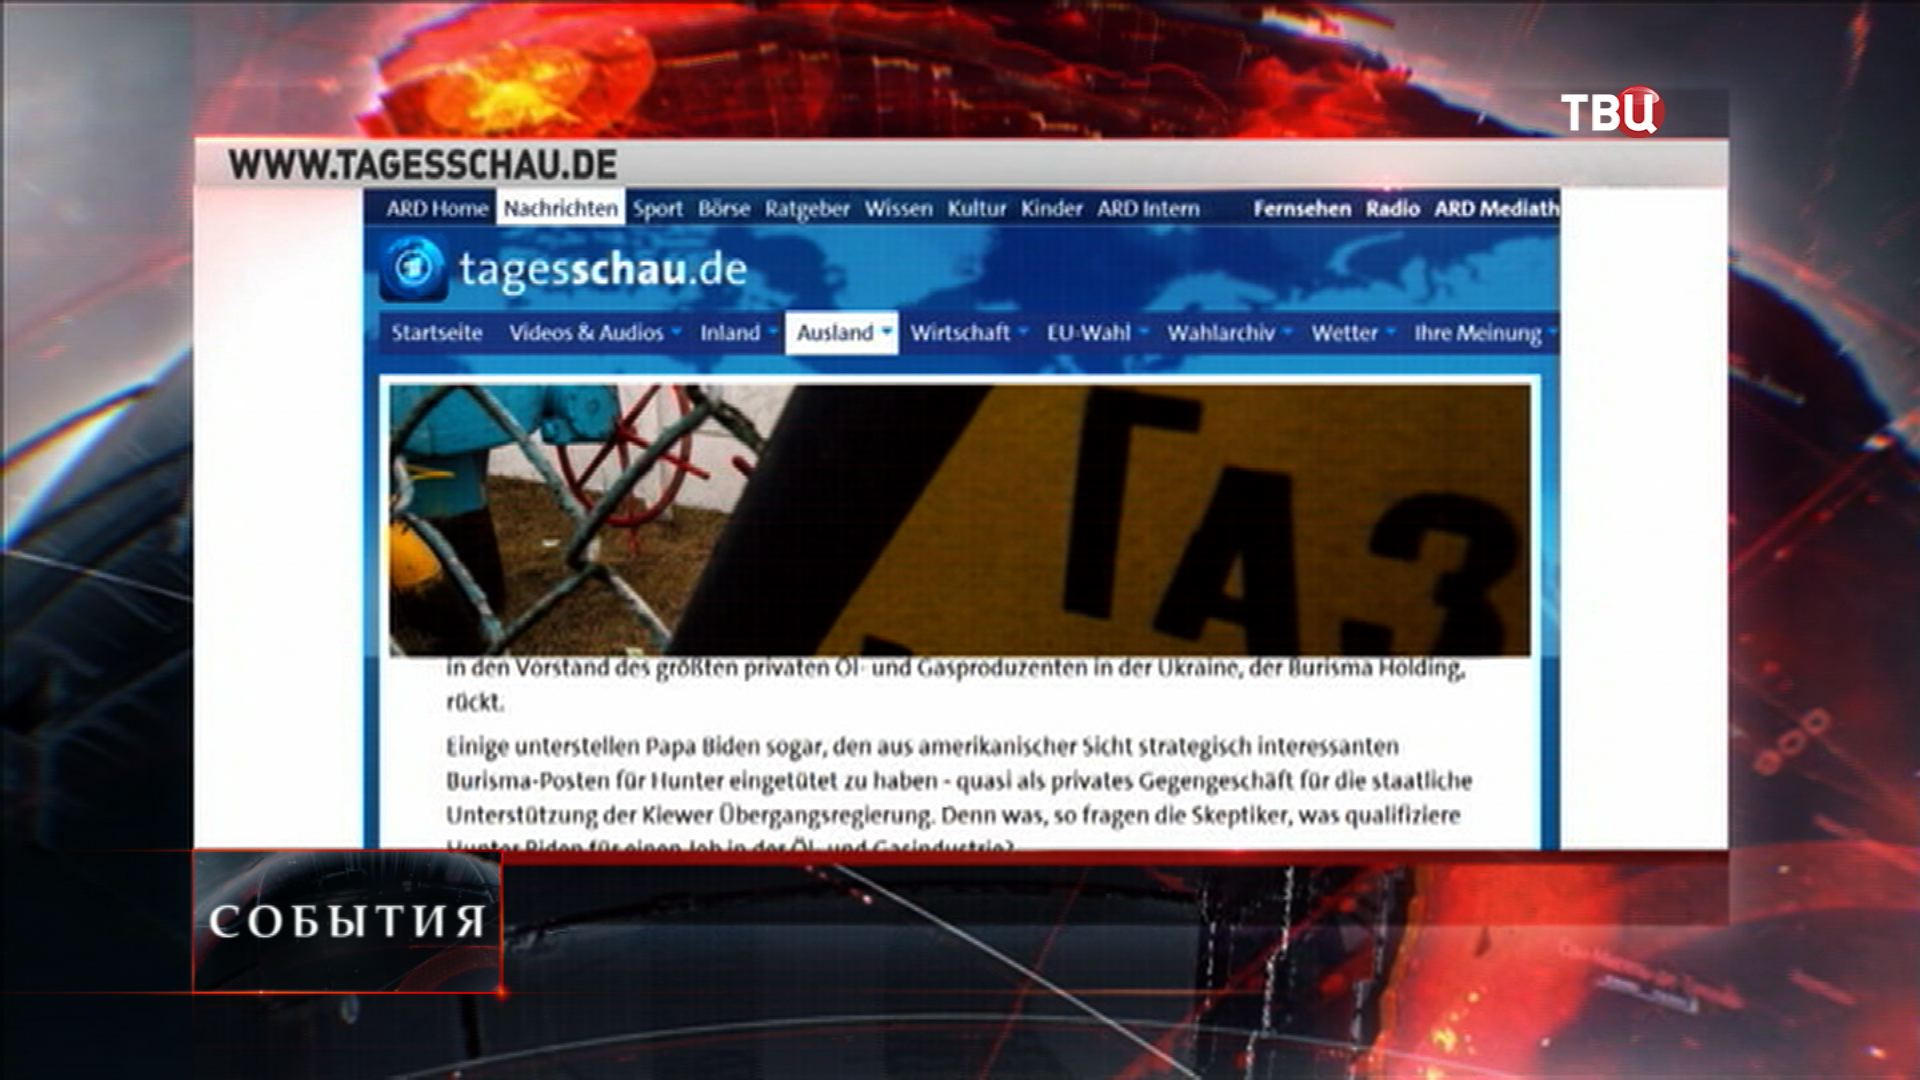 Сайт www.tagesschau.de